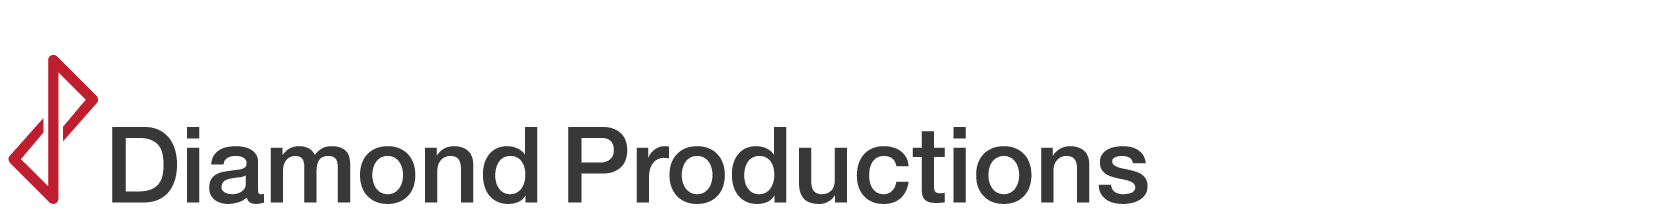 Diamond Productions